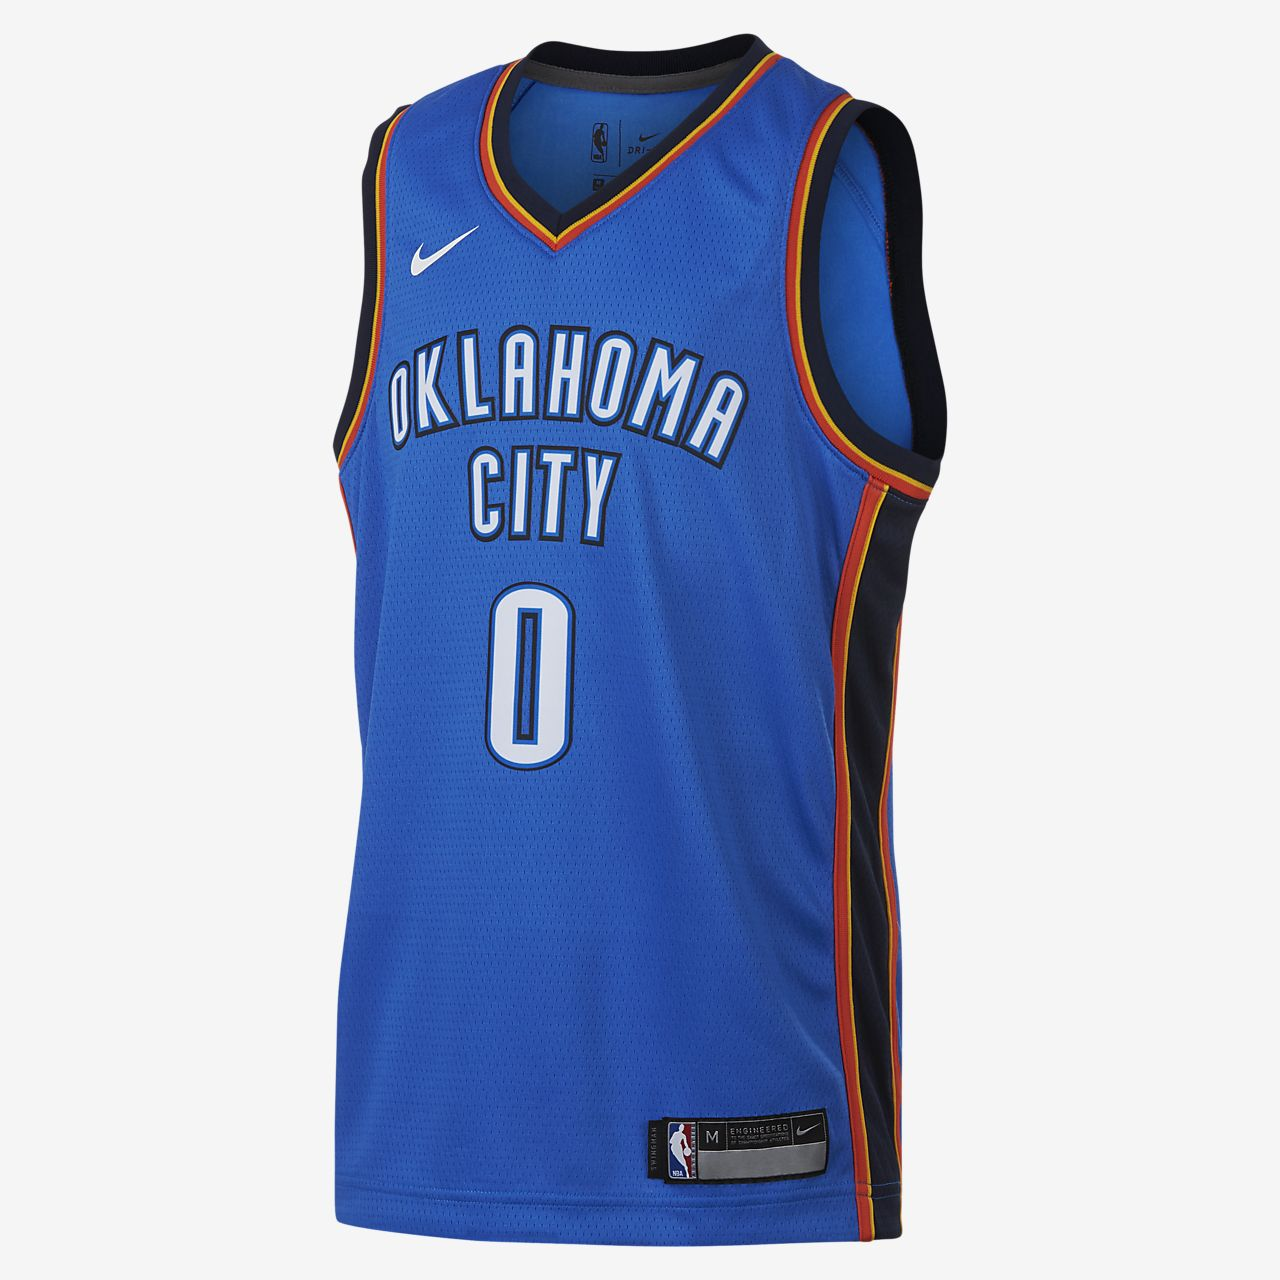 Maillot de NBA Russell Westbrook Oklahoma City Thunder Nike Icon Edition Swingman pour Enfant plus âgé